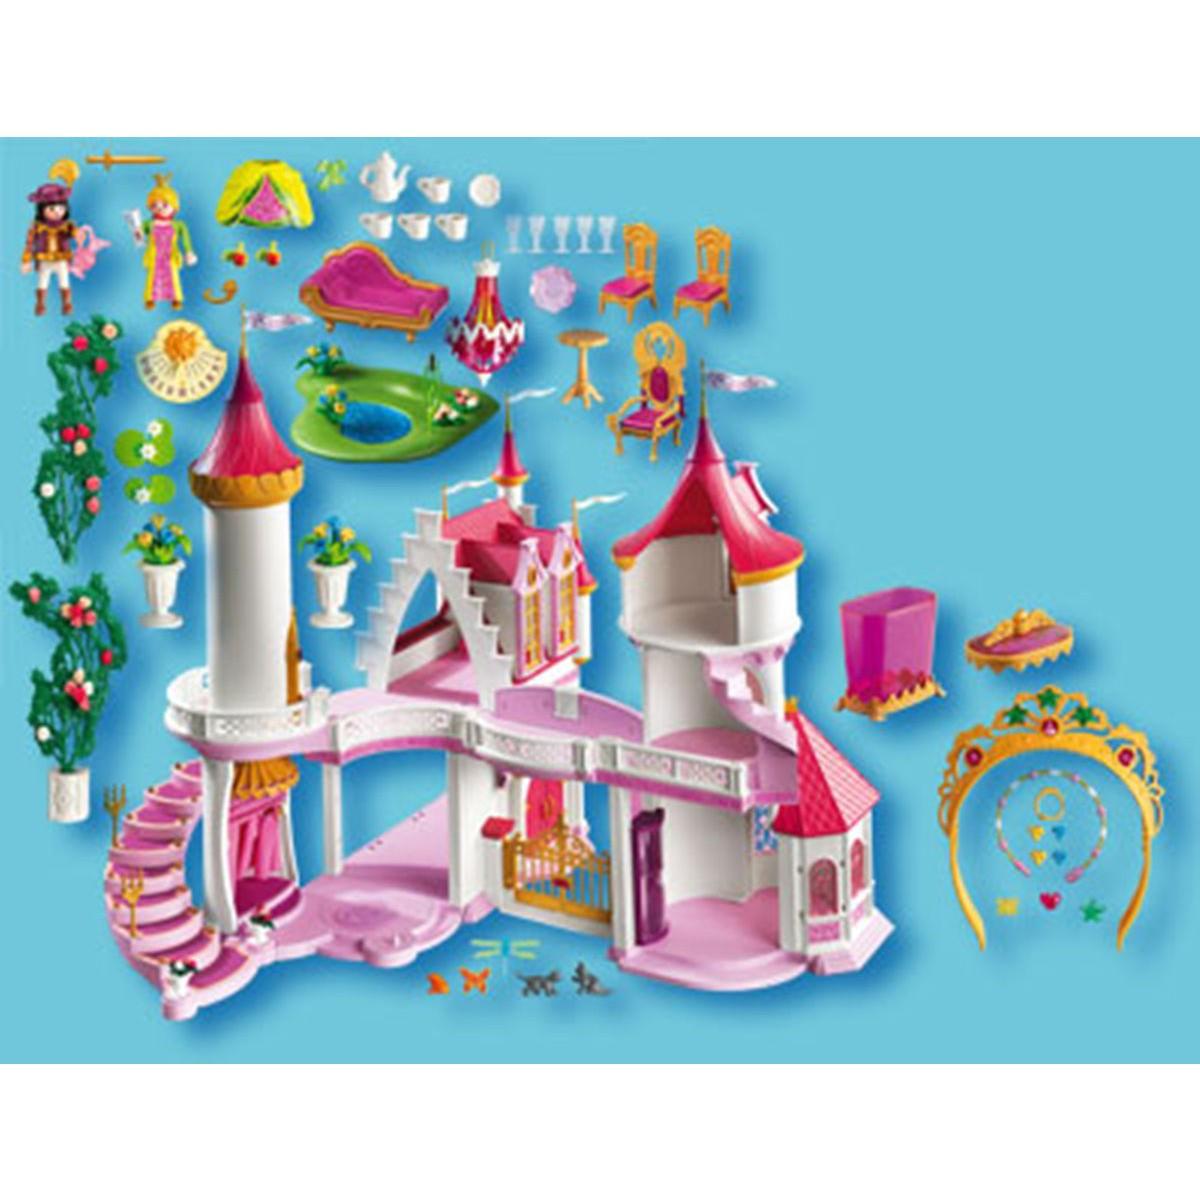 Playmobil princesse palais chateau u montellier - Playmobil princesse chateau ...